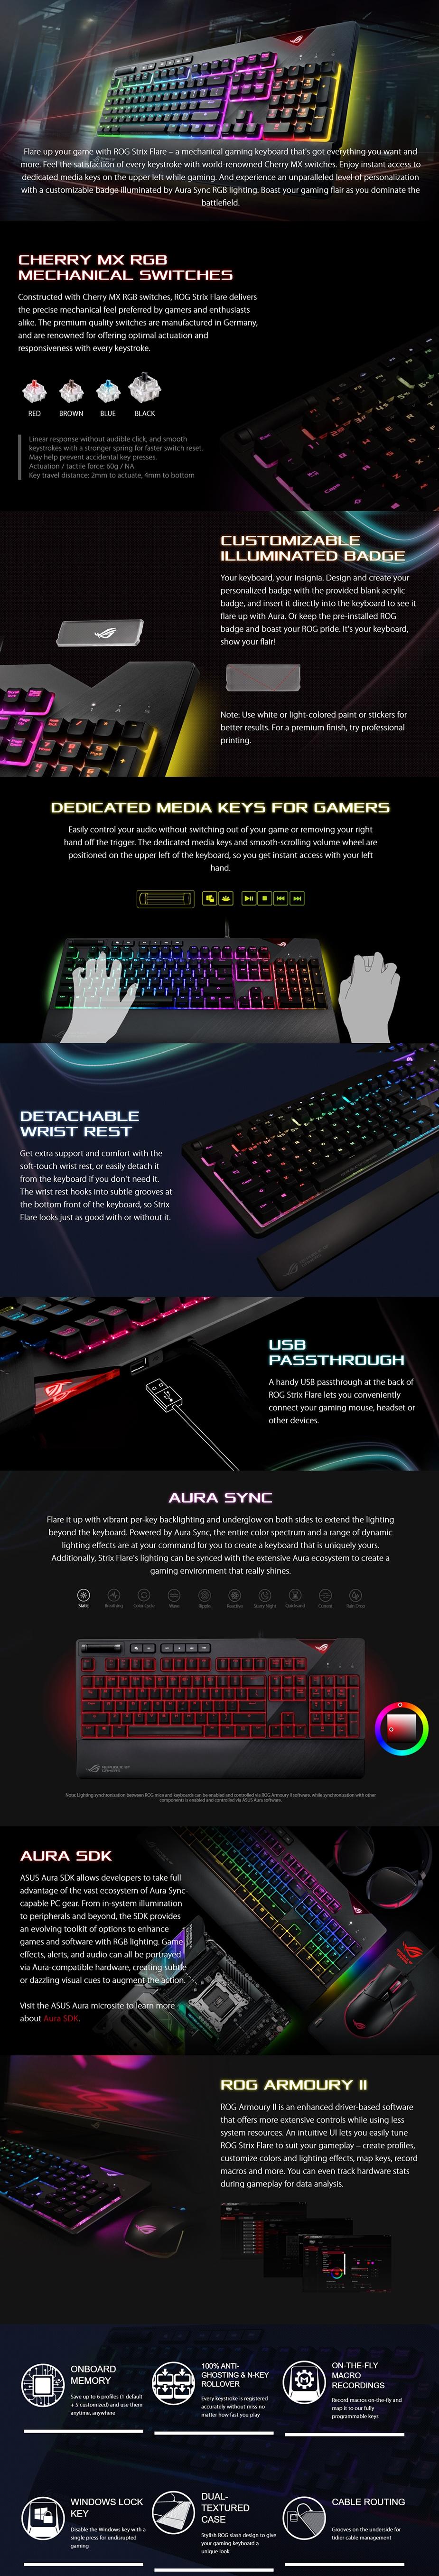 ASUS ROG Strix Flare RGB Mechanical Gaming Keyboard - Cherry MX Blue - ROG  STRIX FLARE/BLU | Mwave.com.au